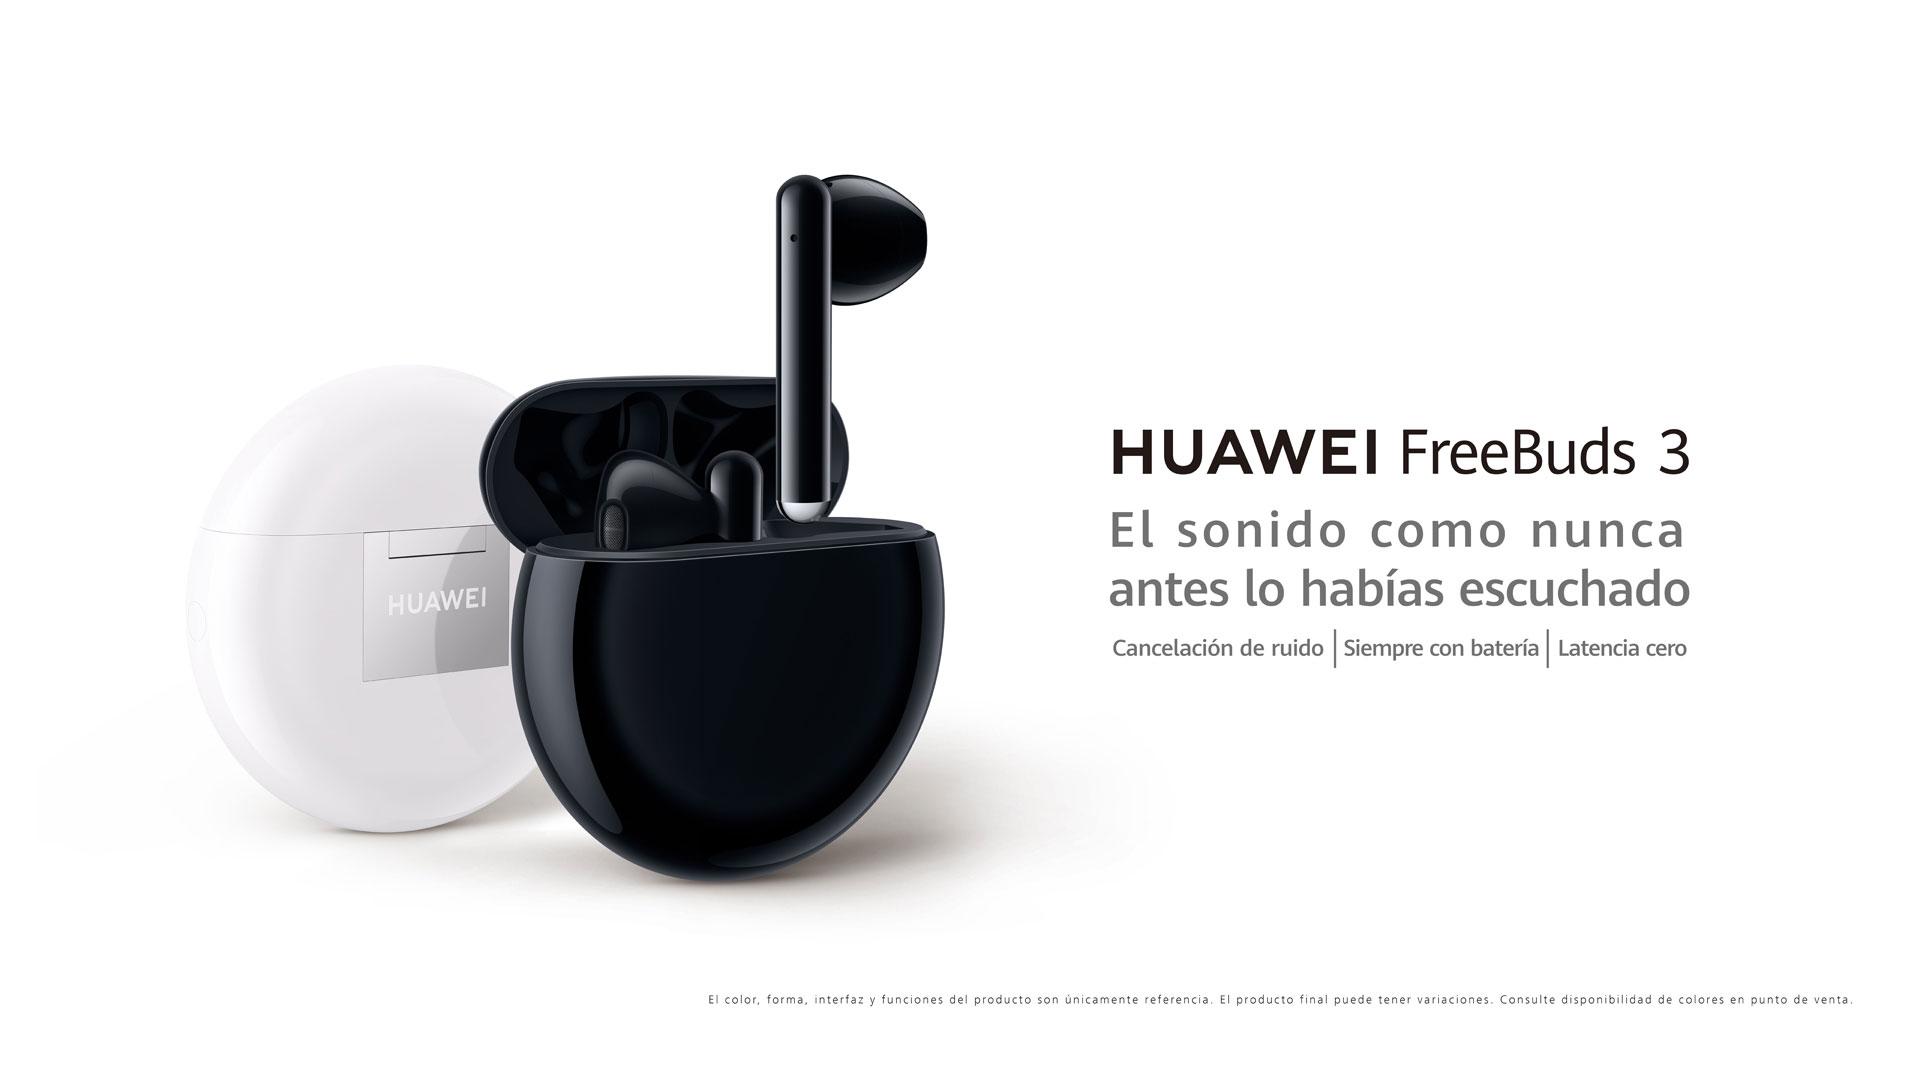 Huawei FreeBuds 3